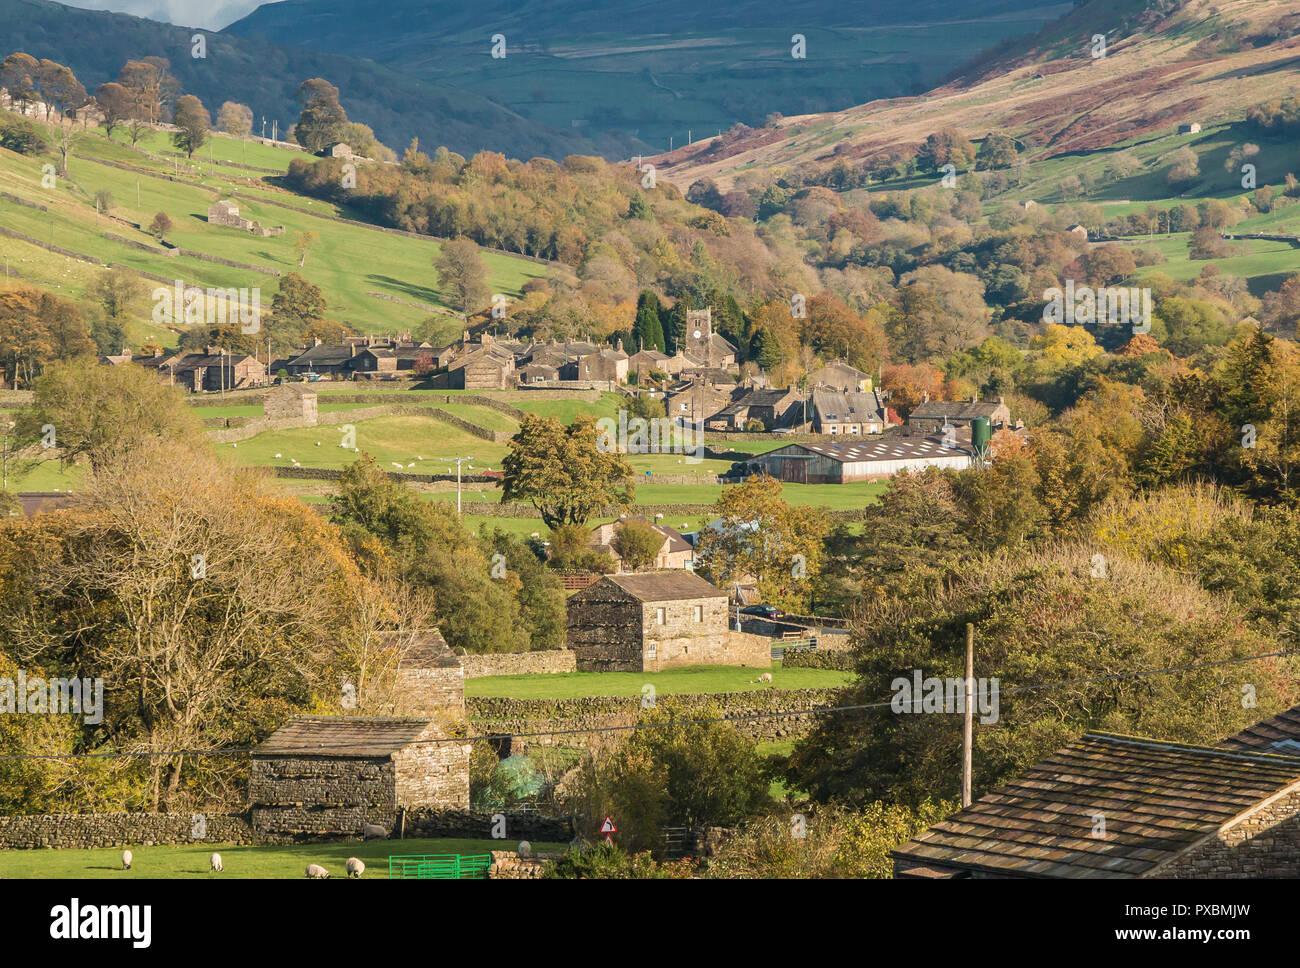 yorkshire-dales-national-park-autumn-landscape-the-village-of-muker-swaledale-PXBMJW.jpg